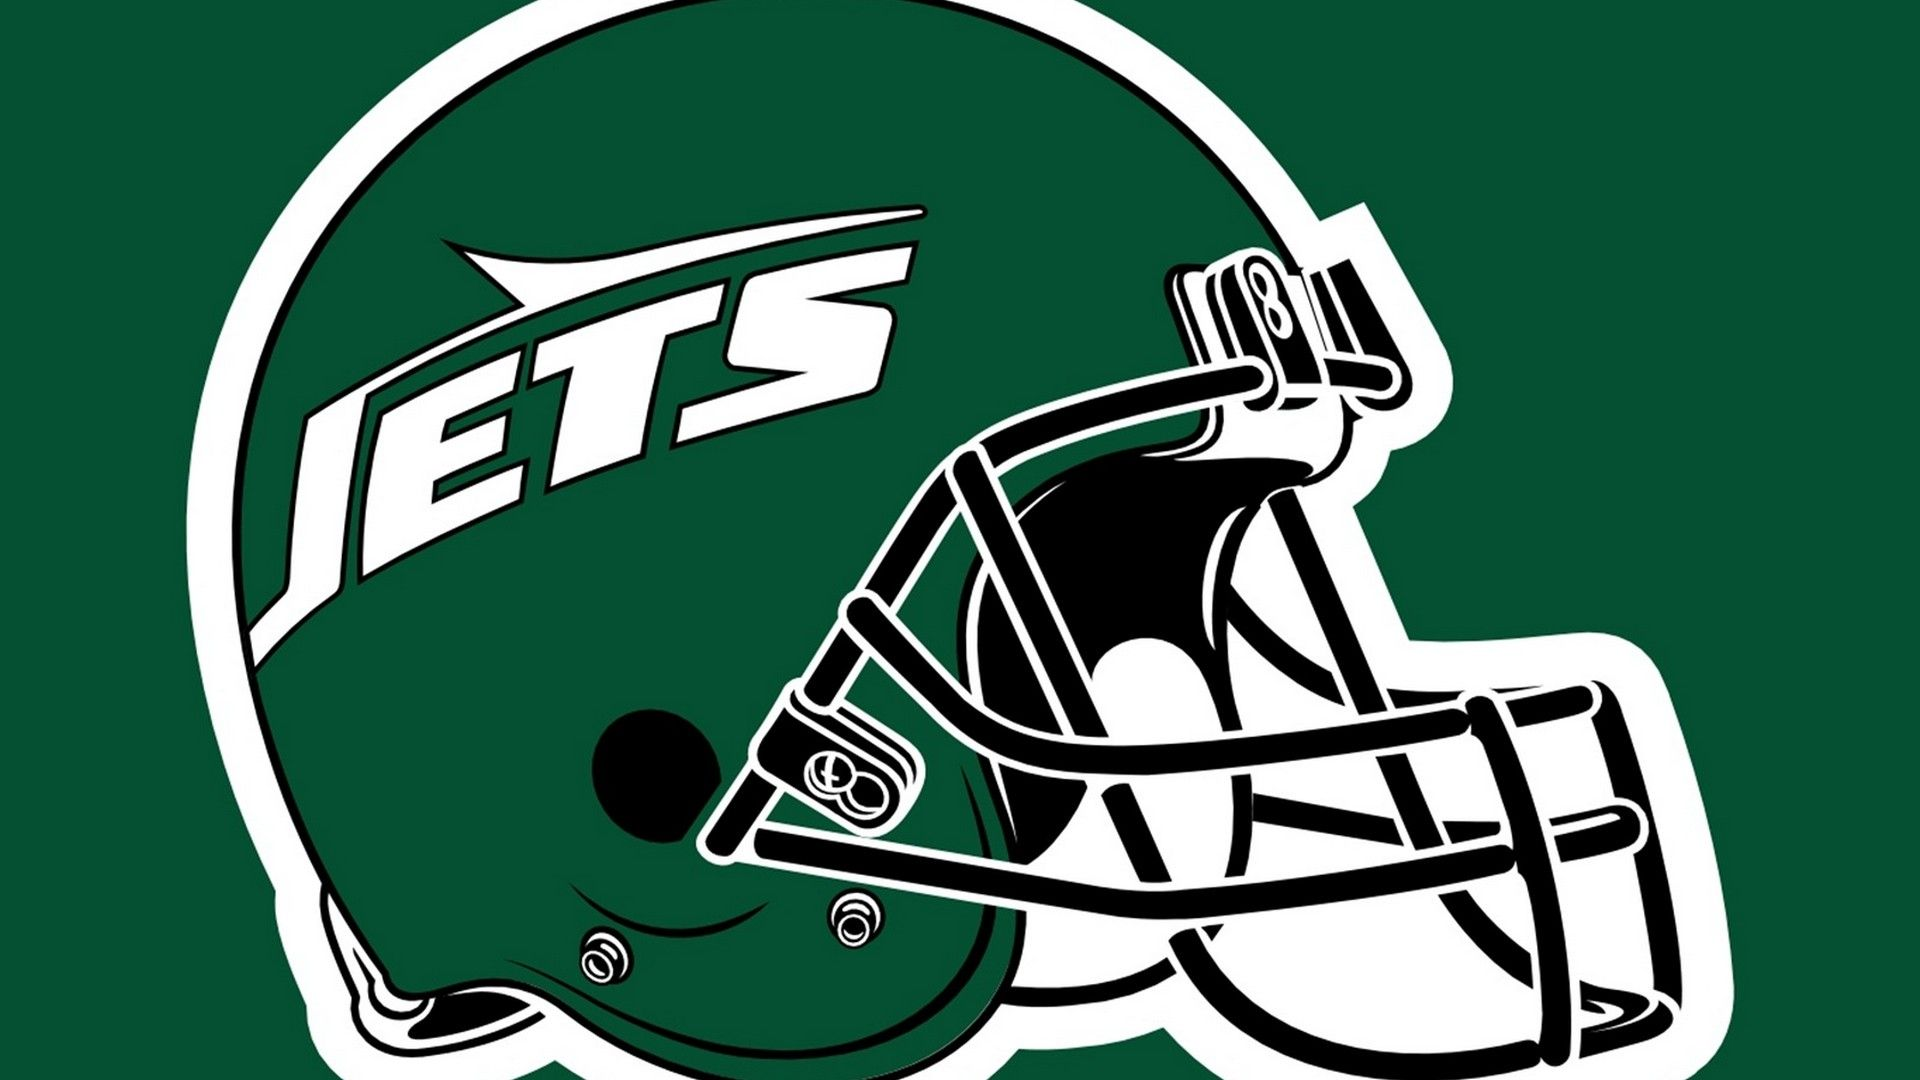 New York Jets Desktop Wallpapers Nfl Football Wallpaper New York Jets Desktop Wallpaper